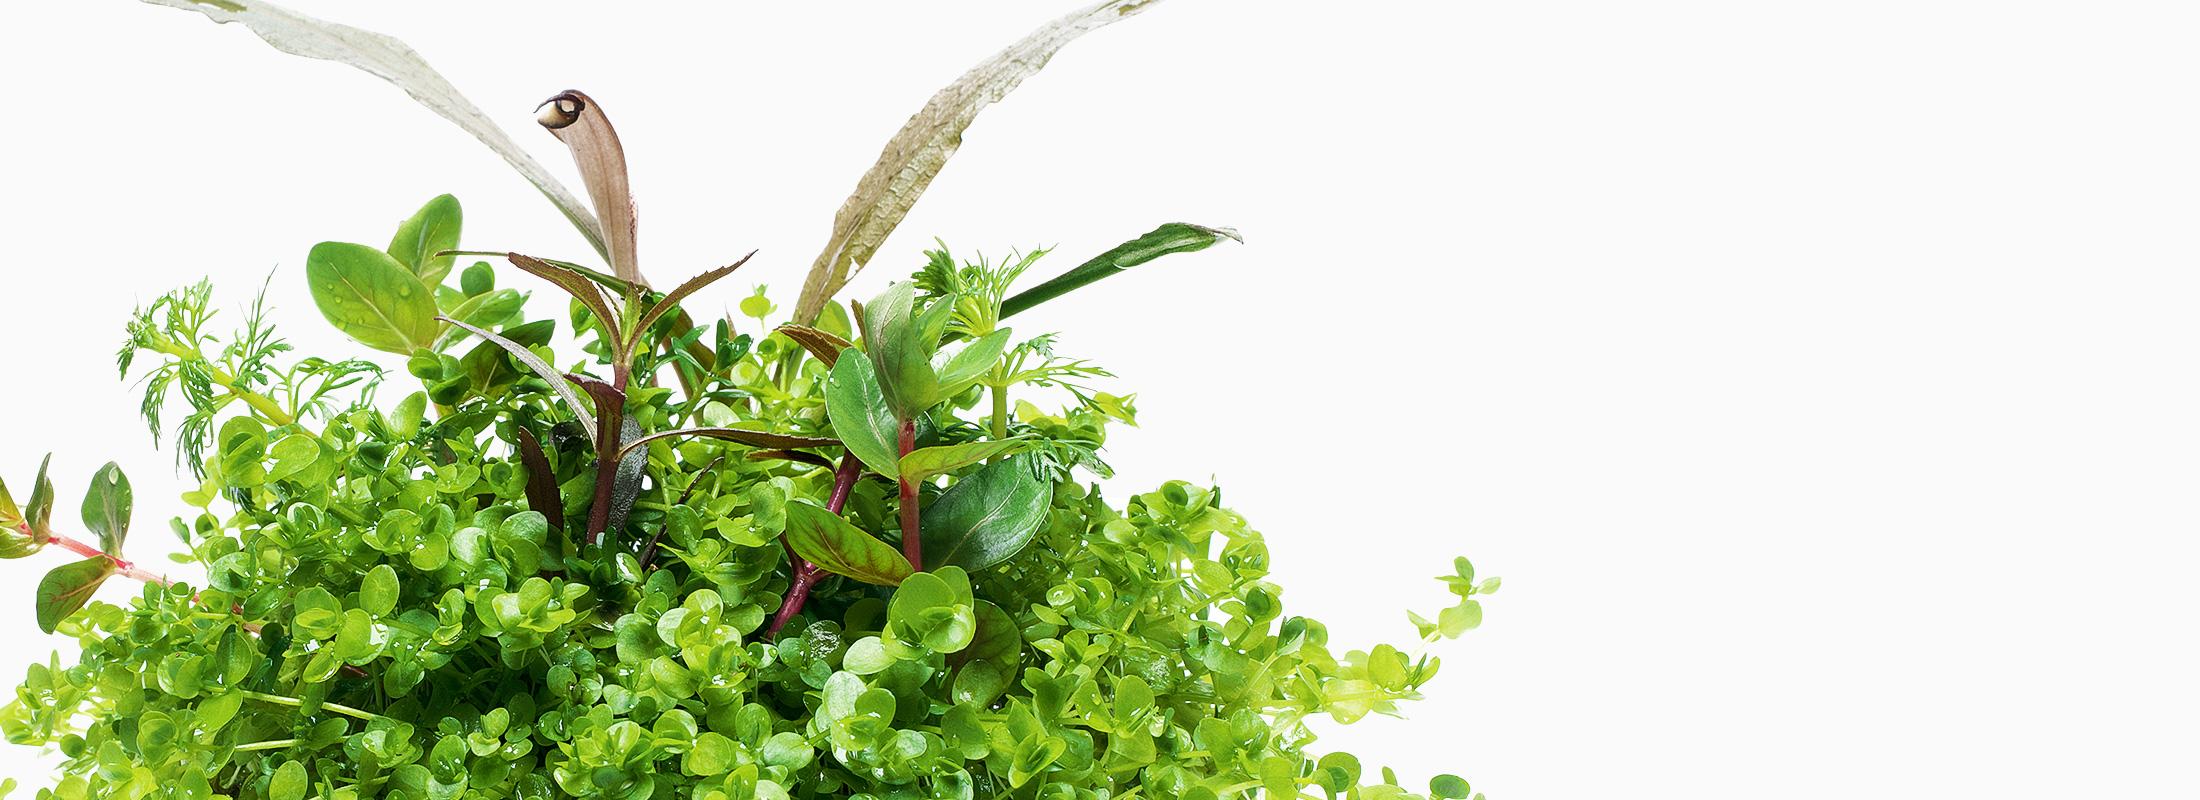 "Mizukusa FOCUS ""Echinodorus & Cryptocoryne MIX for enjoying flowers"""